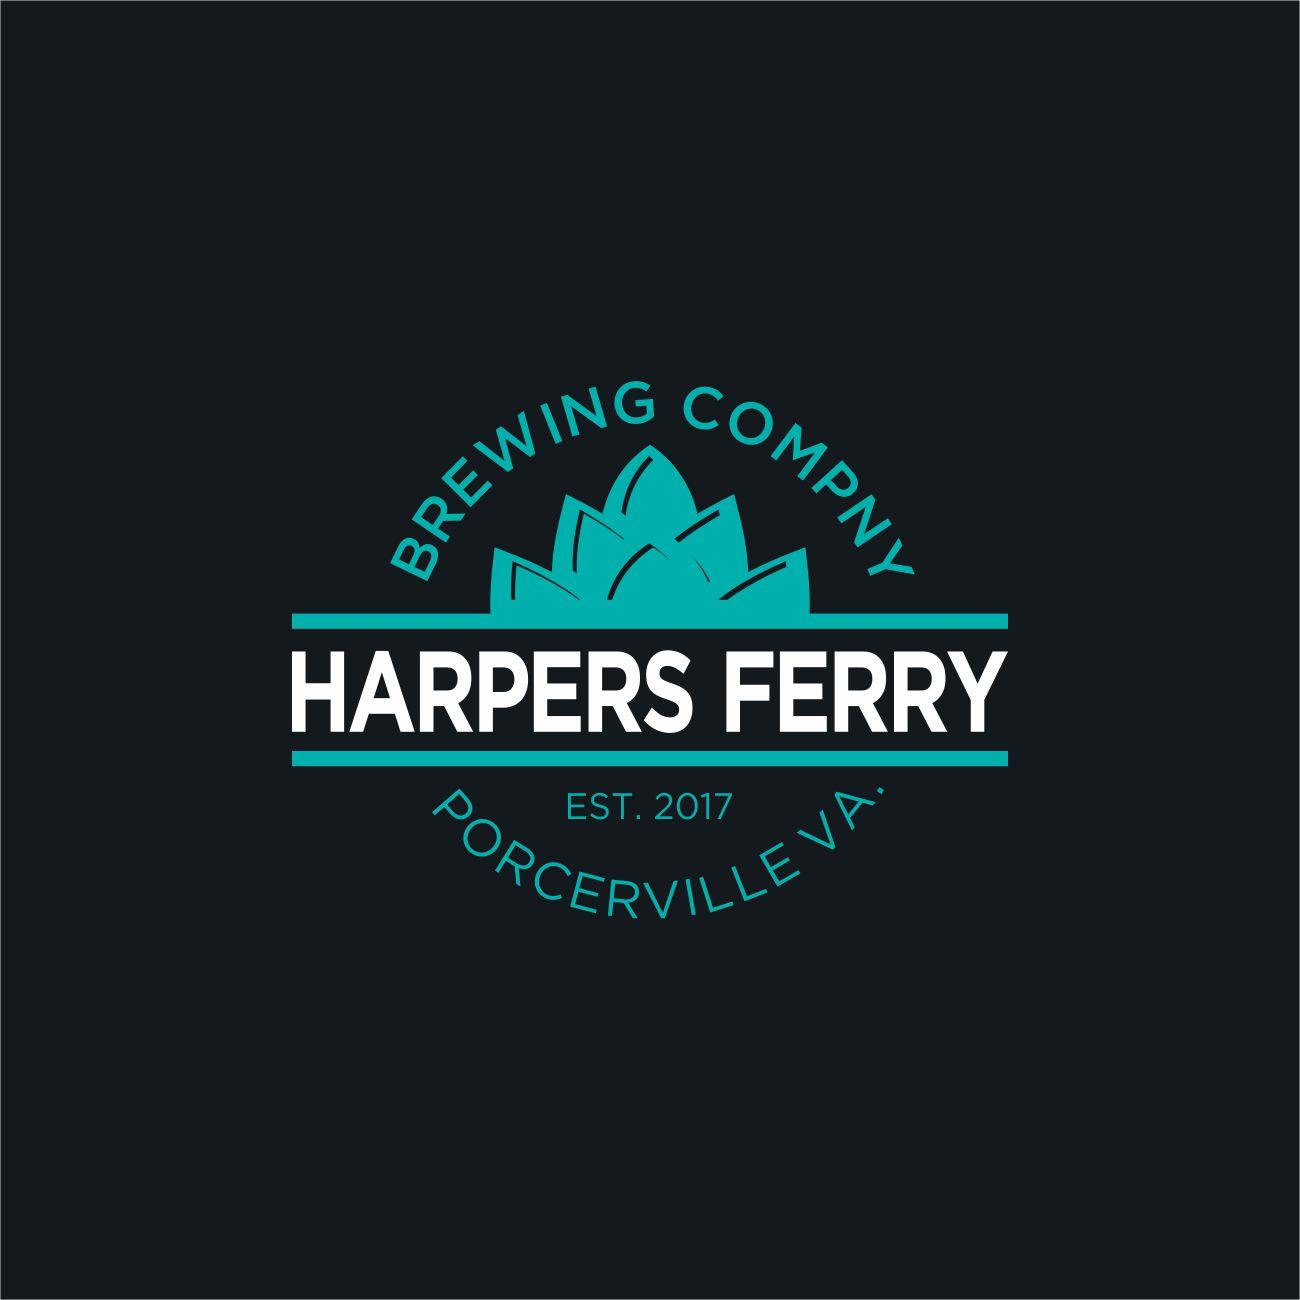 Logo Design by RasYa Muhammad Athaya - Entry No. 63 in the Logo Design Contest Unique Logo Design Wanted for Harpers ferry brewing company.